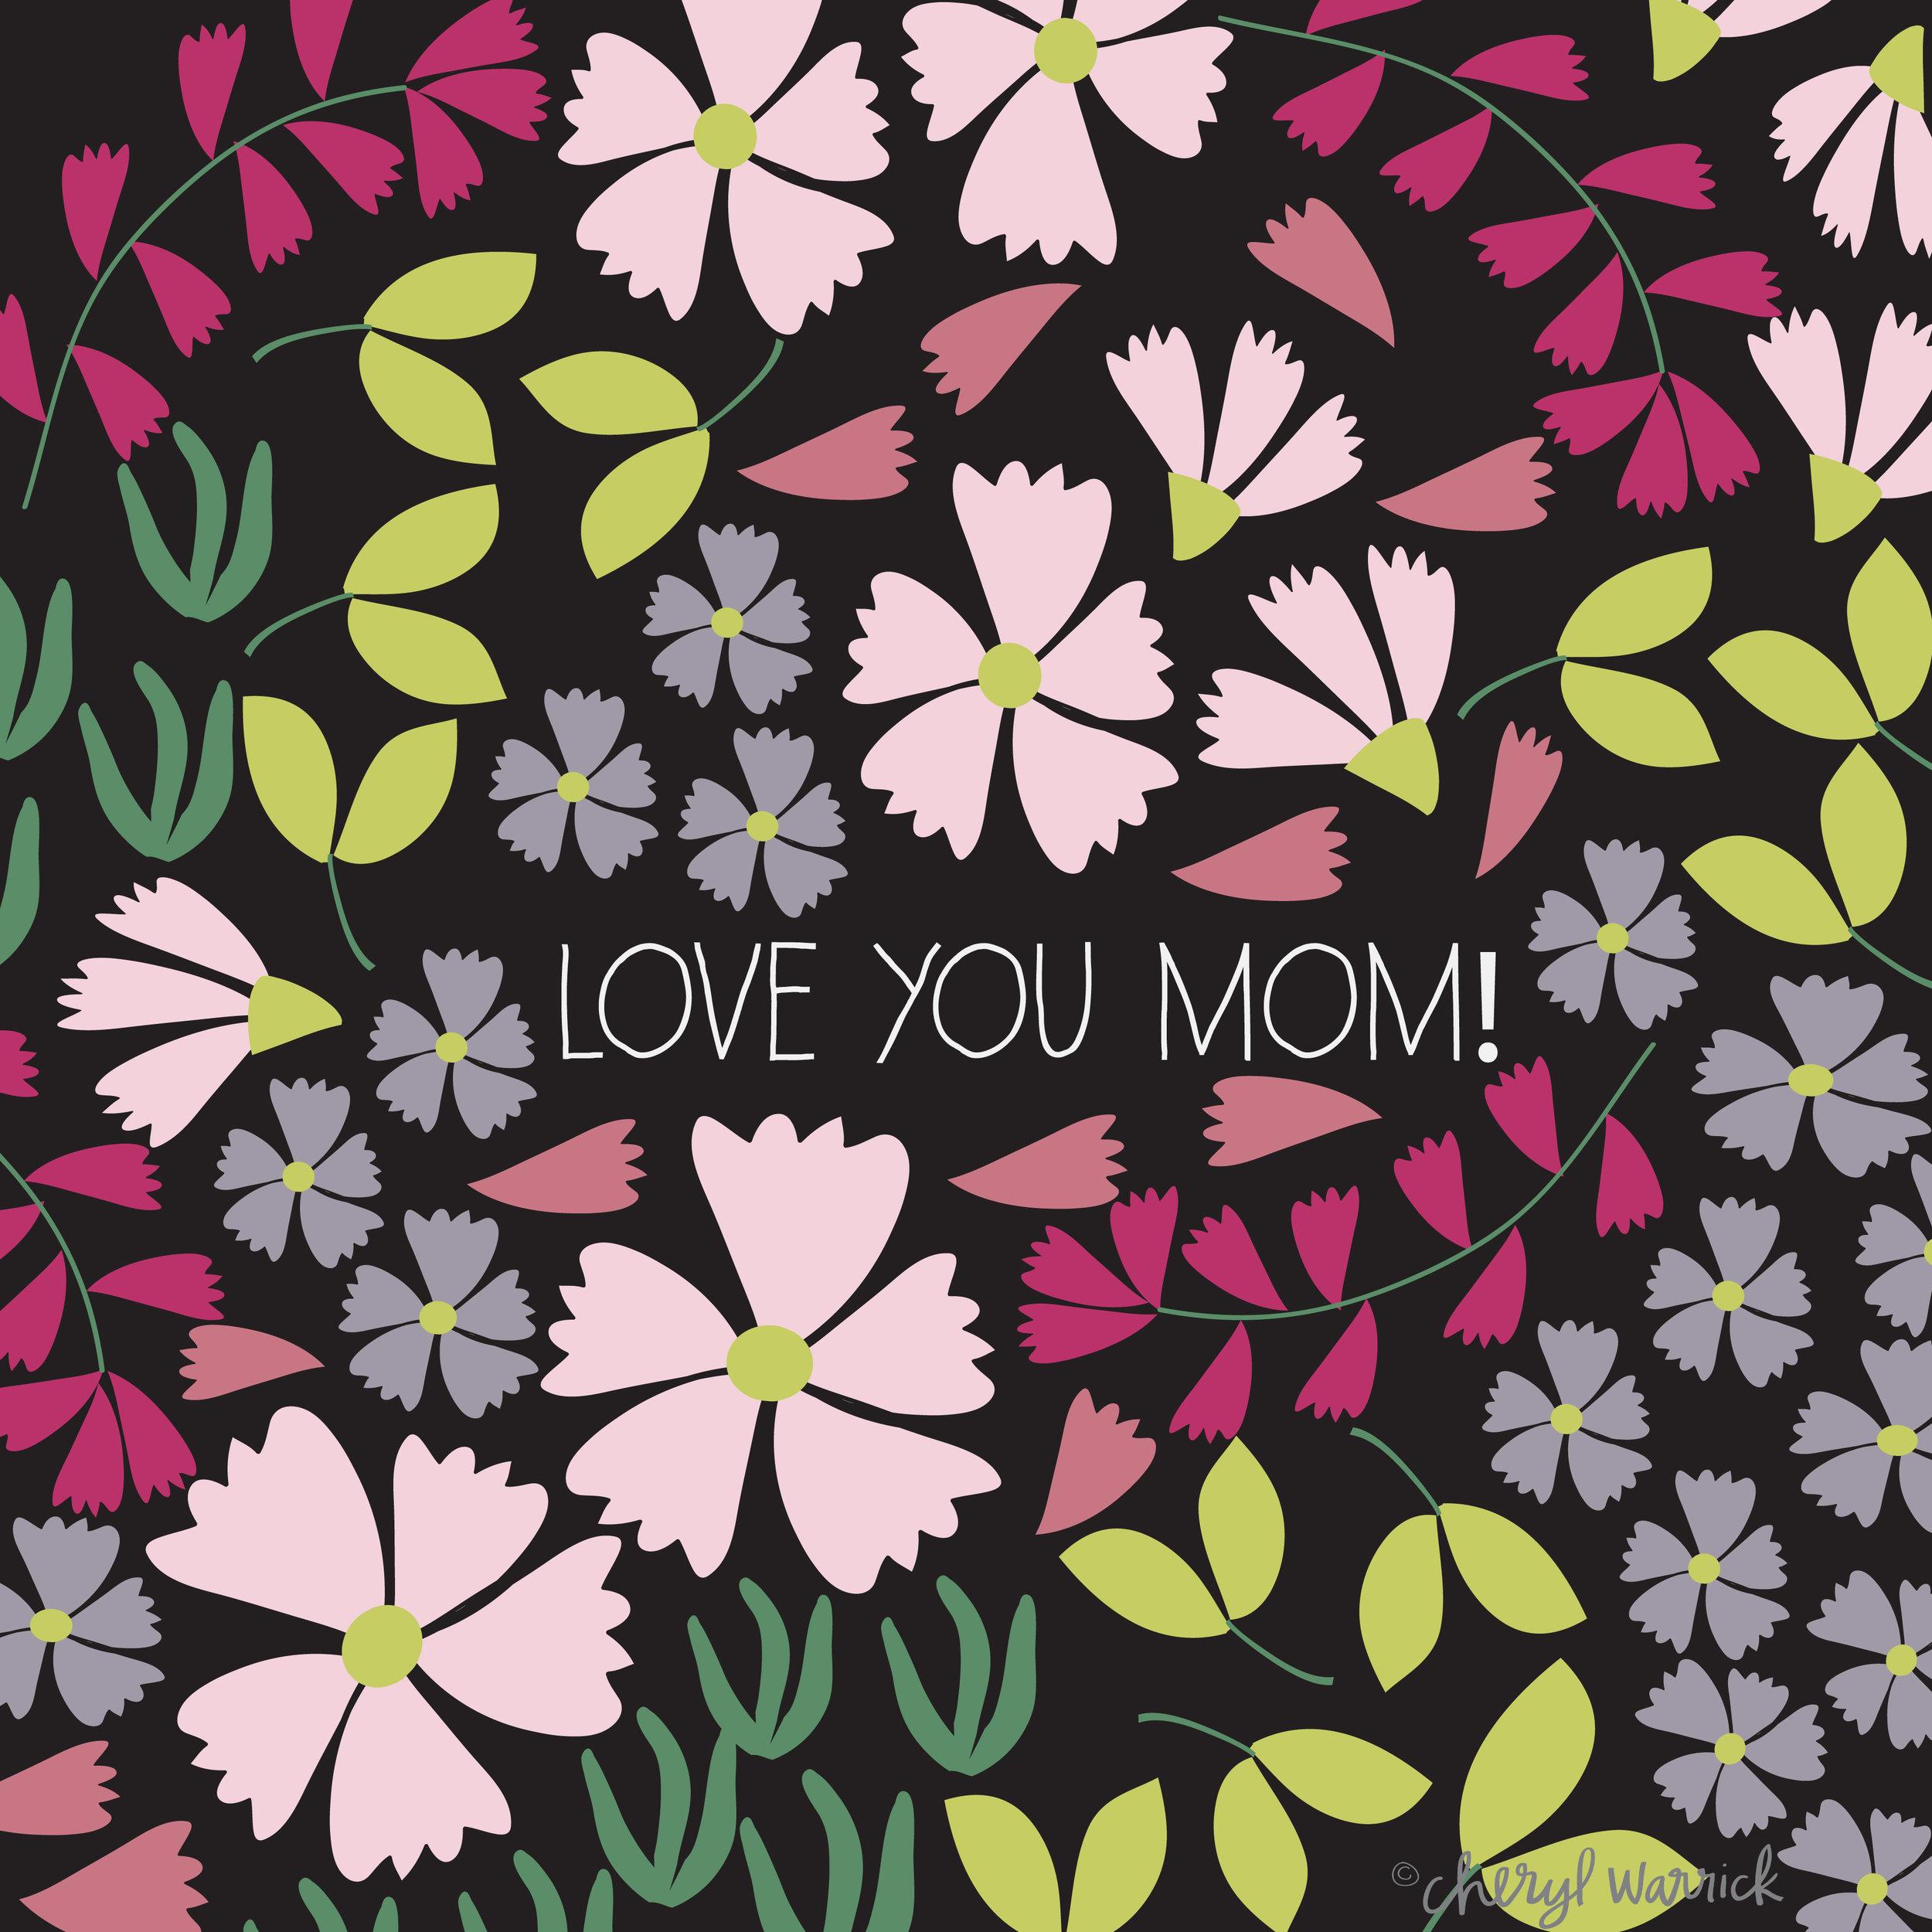 loveyouMOM-01.jpg